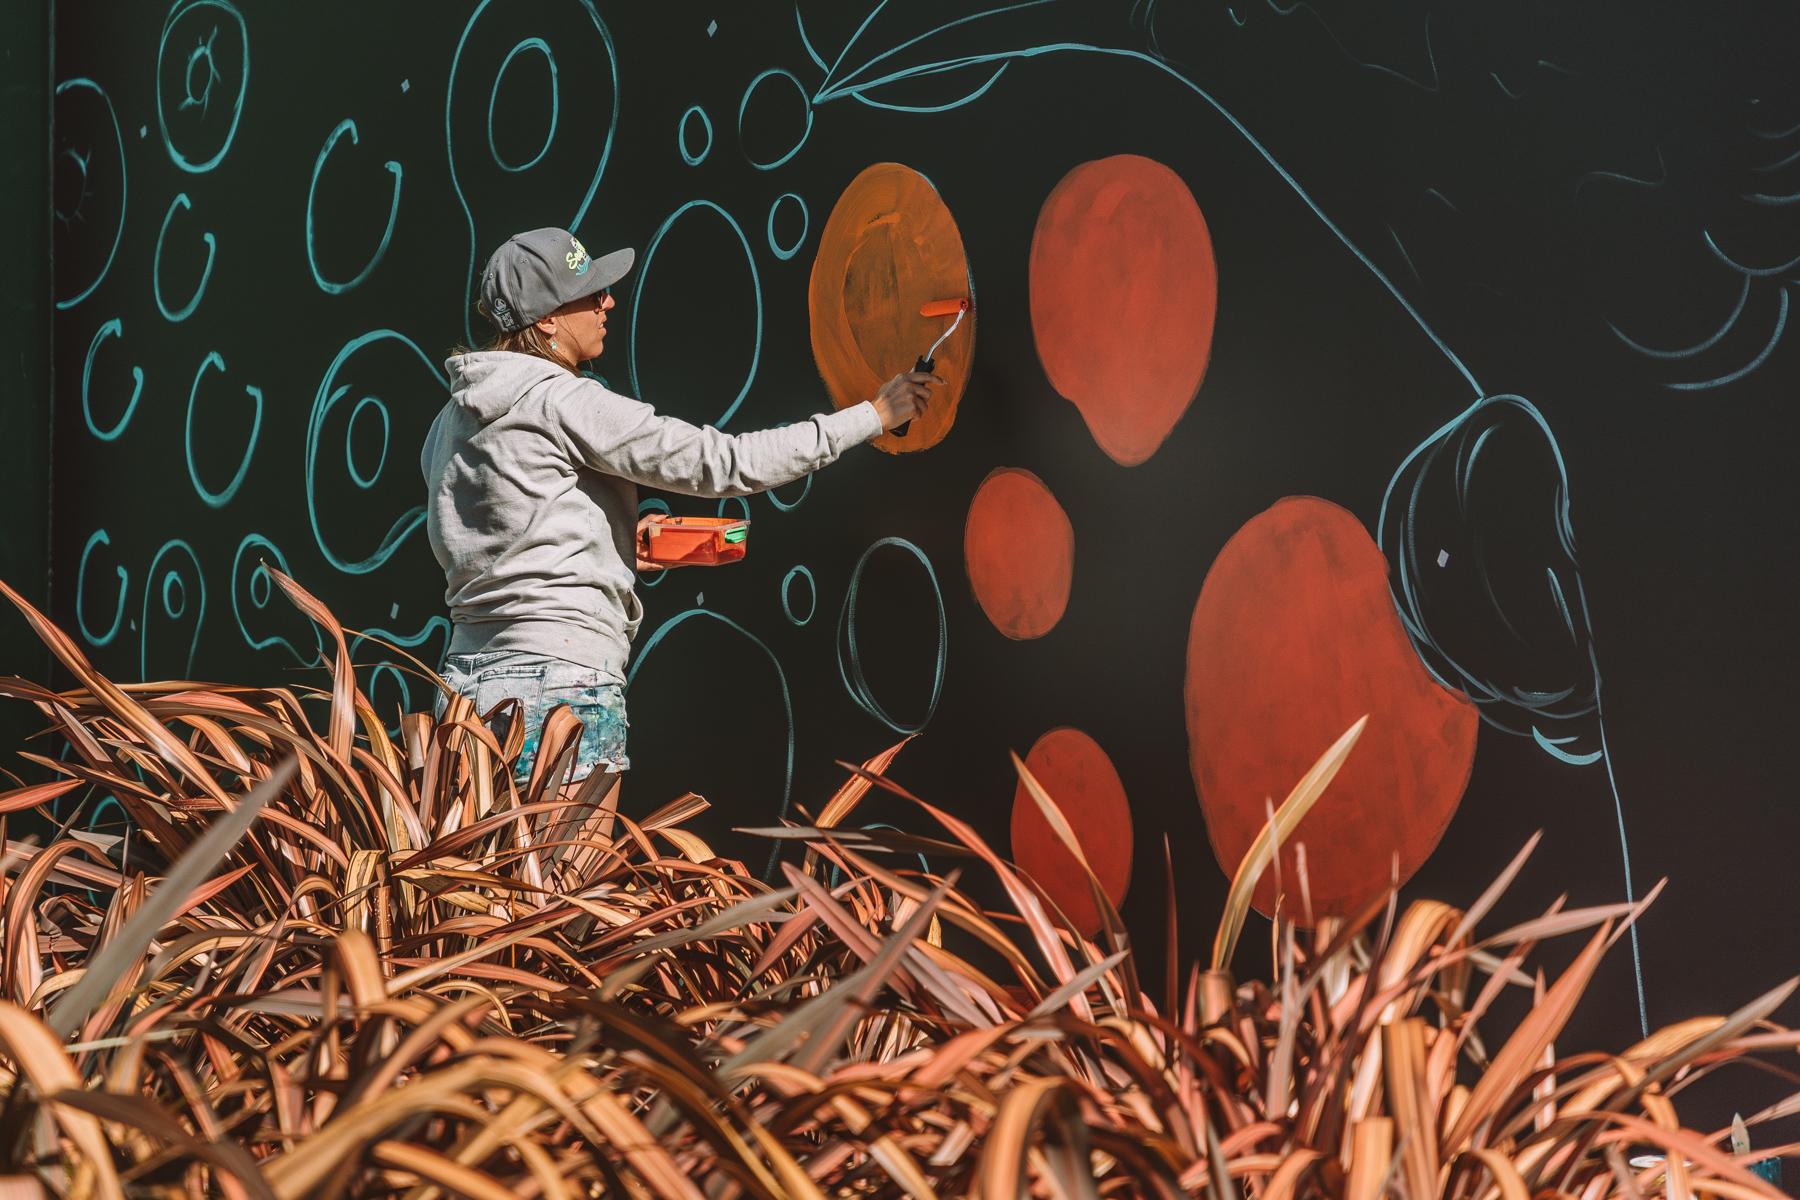 theStyleJungle-2019-Erika-Pearce-Farmlands-Tauranga-002-web.jpg